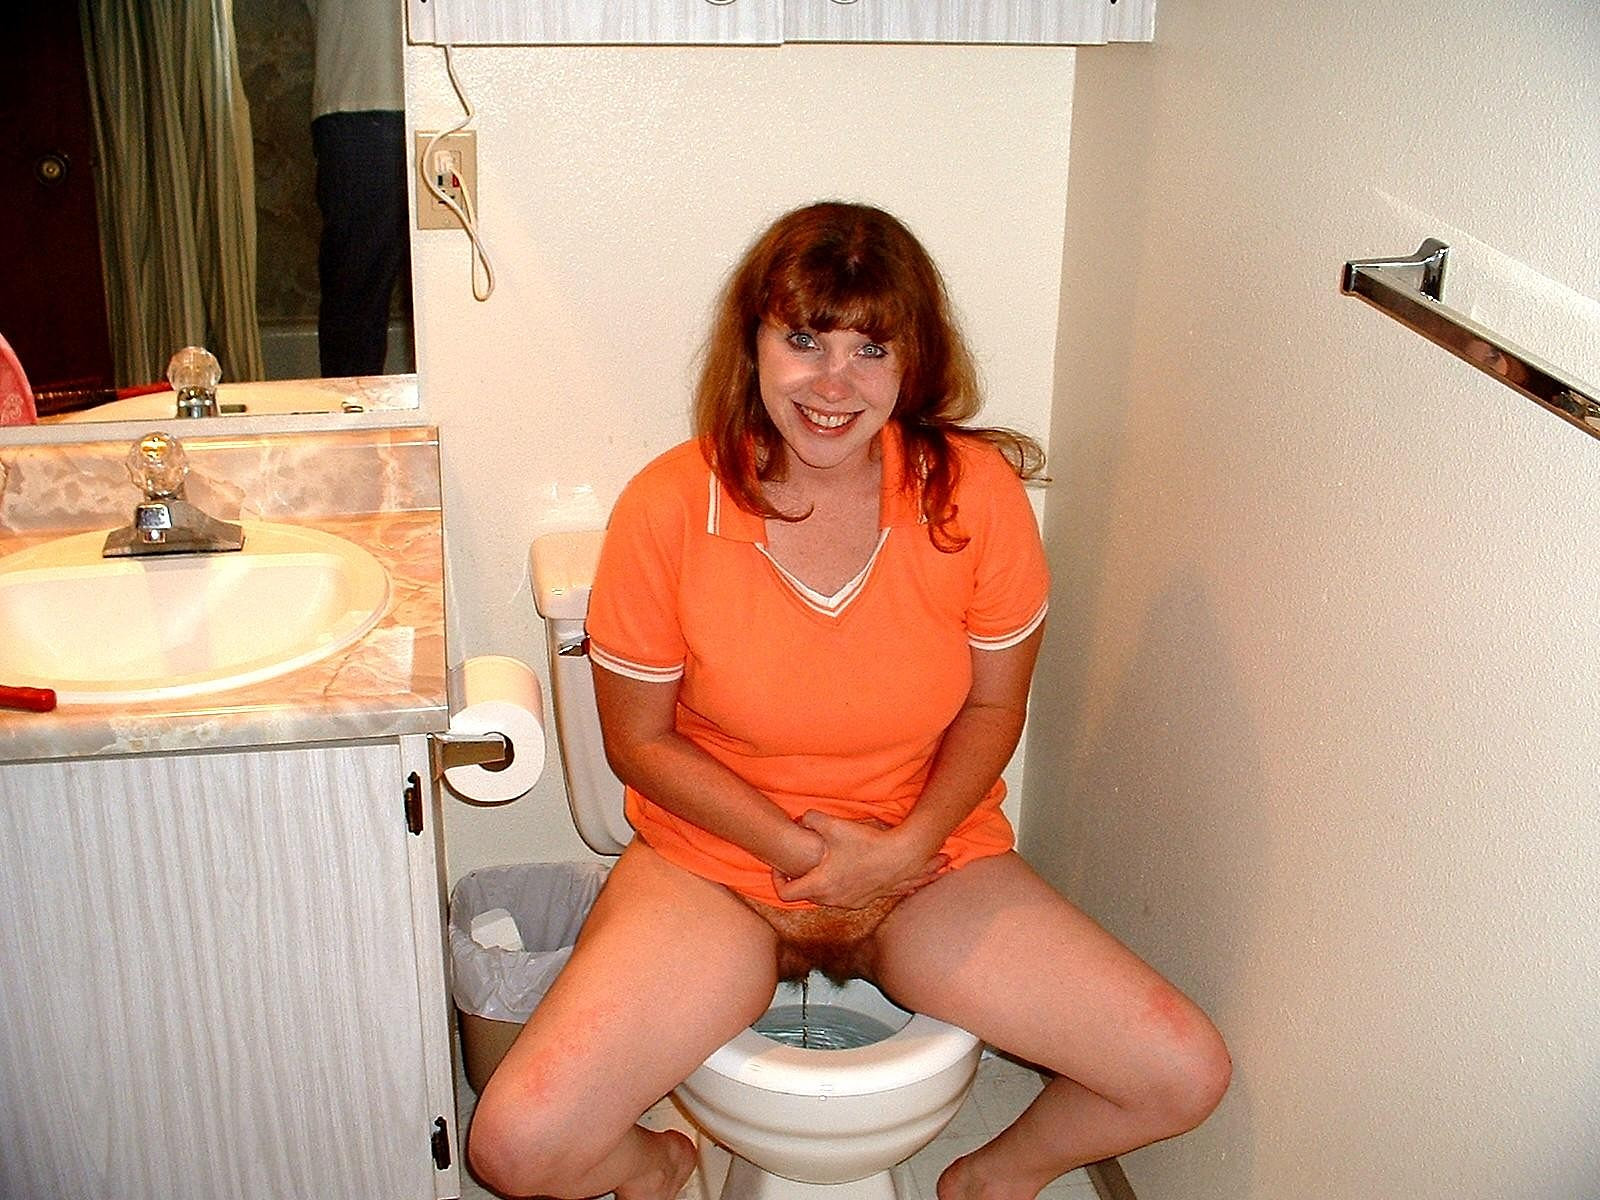 Фото порно в туалете писают 13 фотография